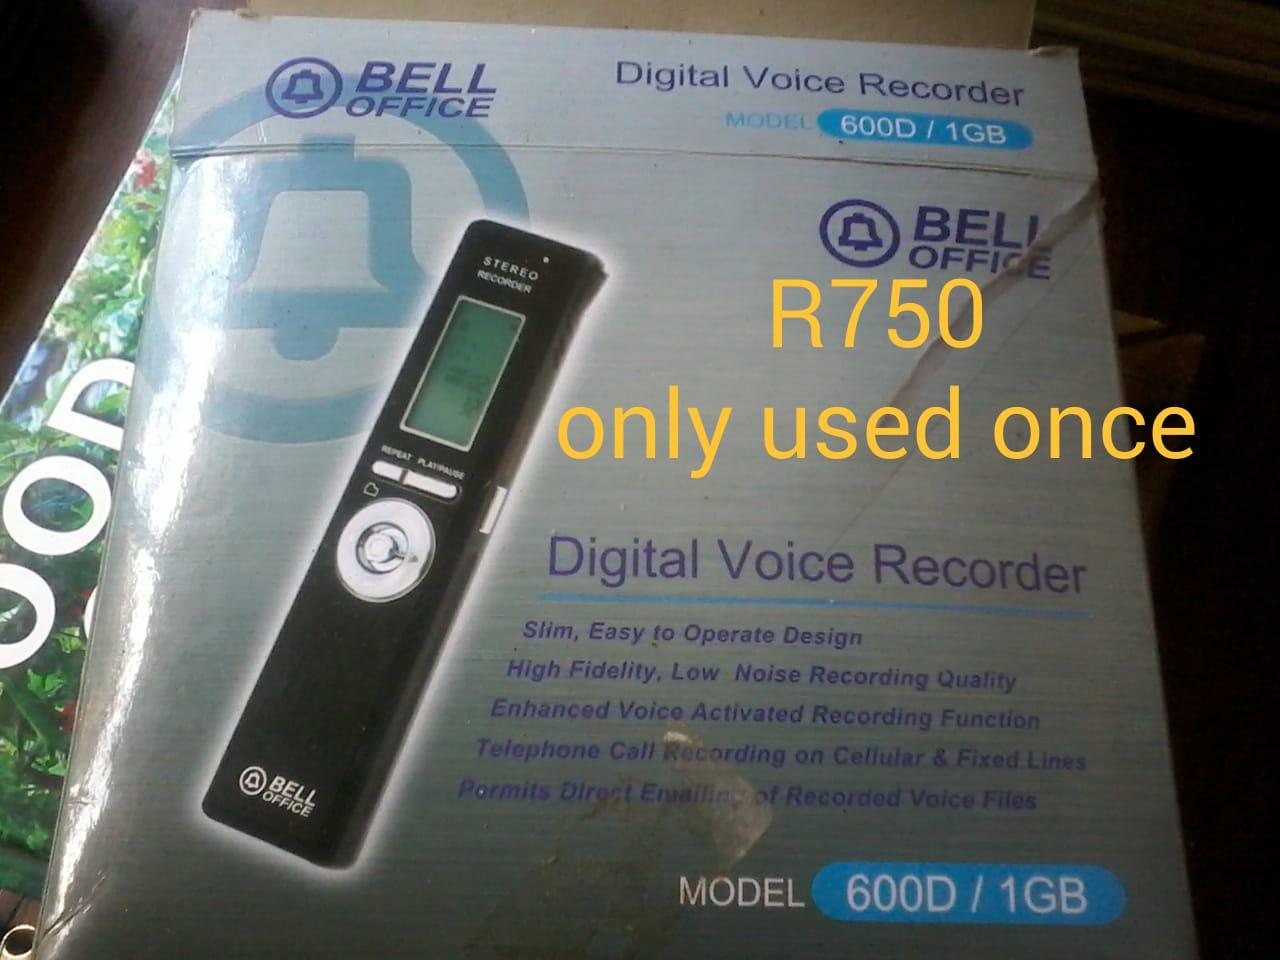 Digital Voice Recorder Model 600D/1GB - Bell Office